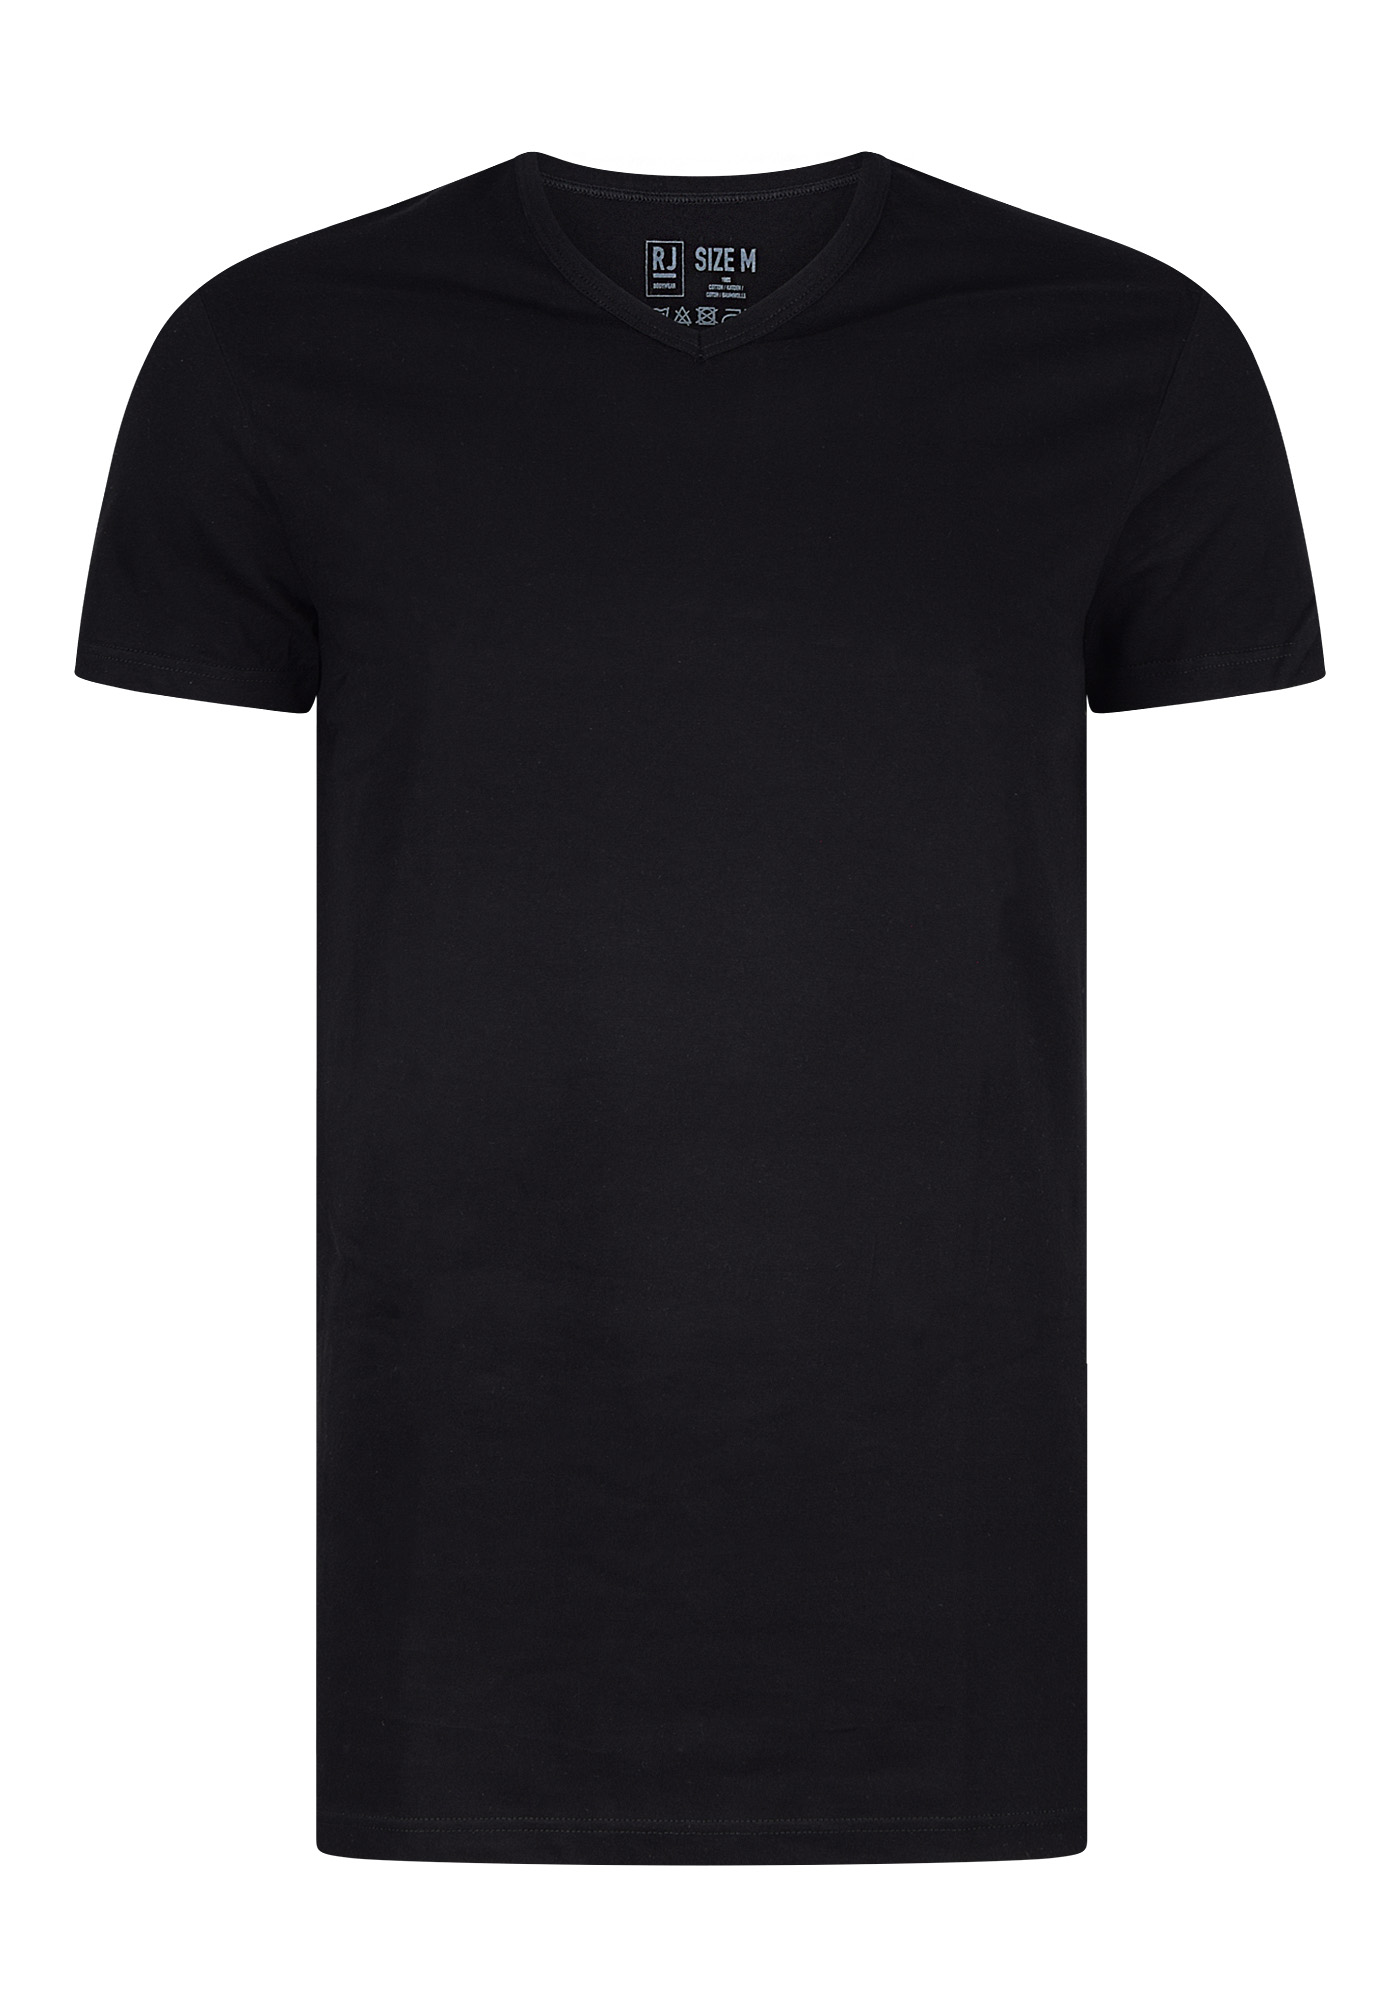 096e184606b RJ Bodywear Everyday, Gouda, 2-pack, T-shirt V-hals smal, zwart ...